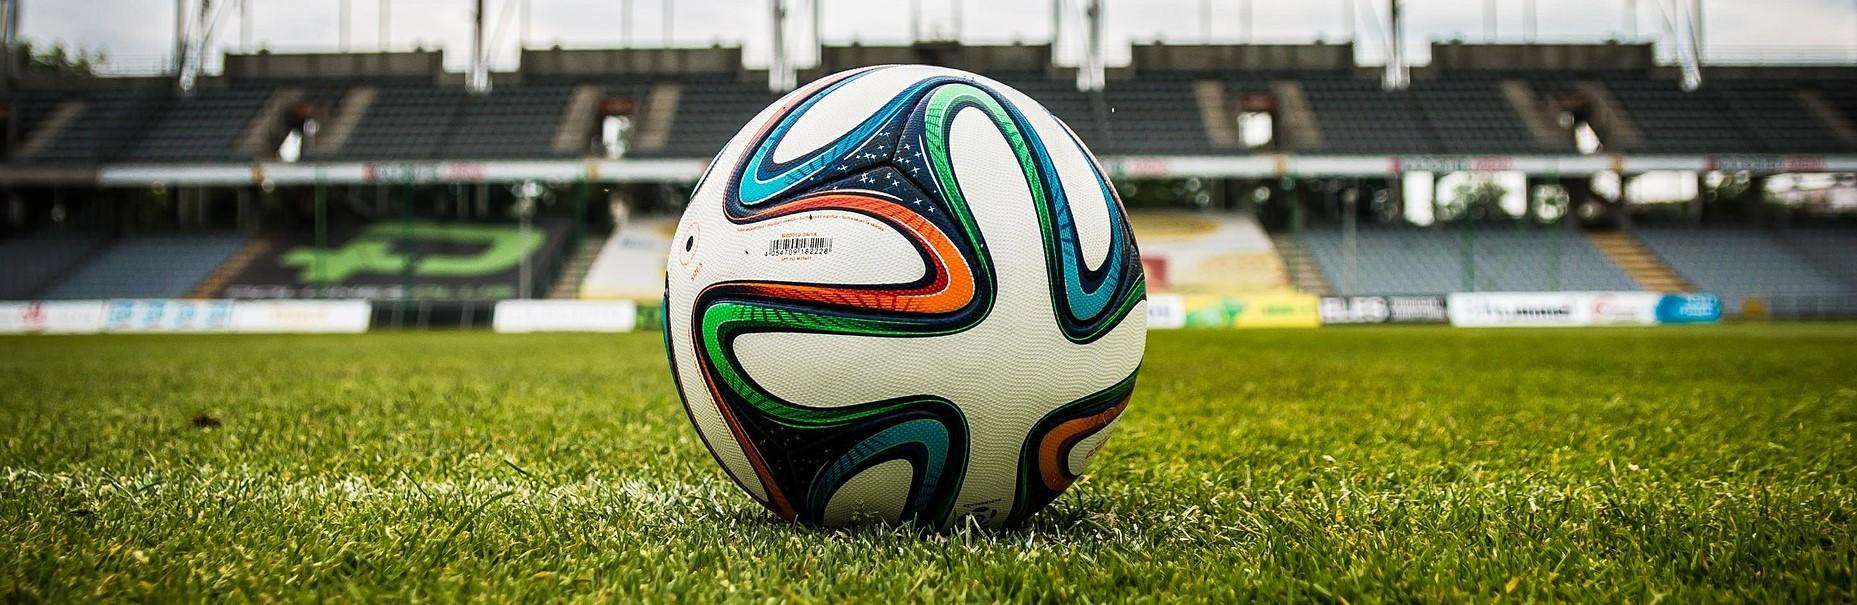 soccertipsblog